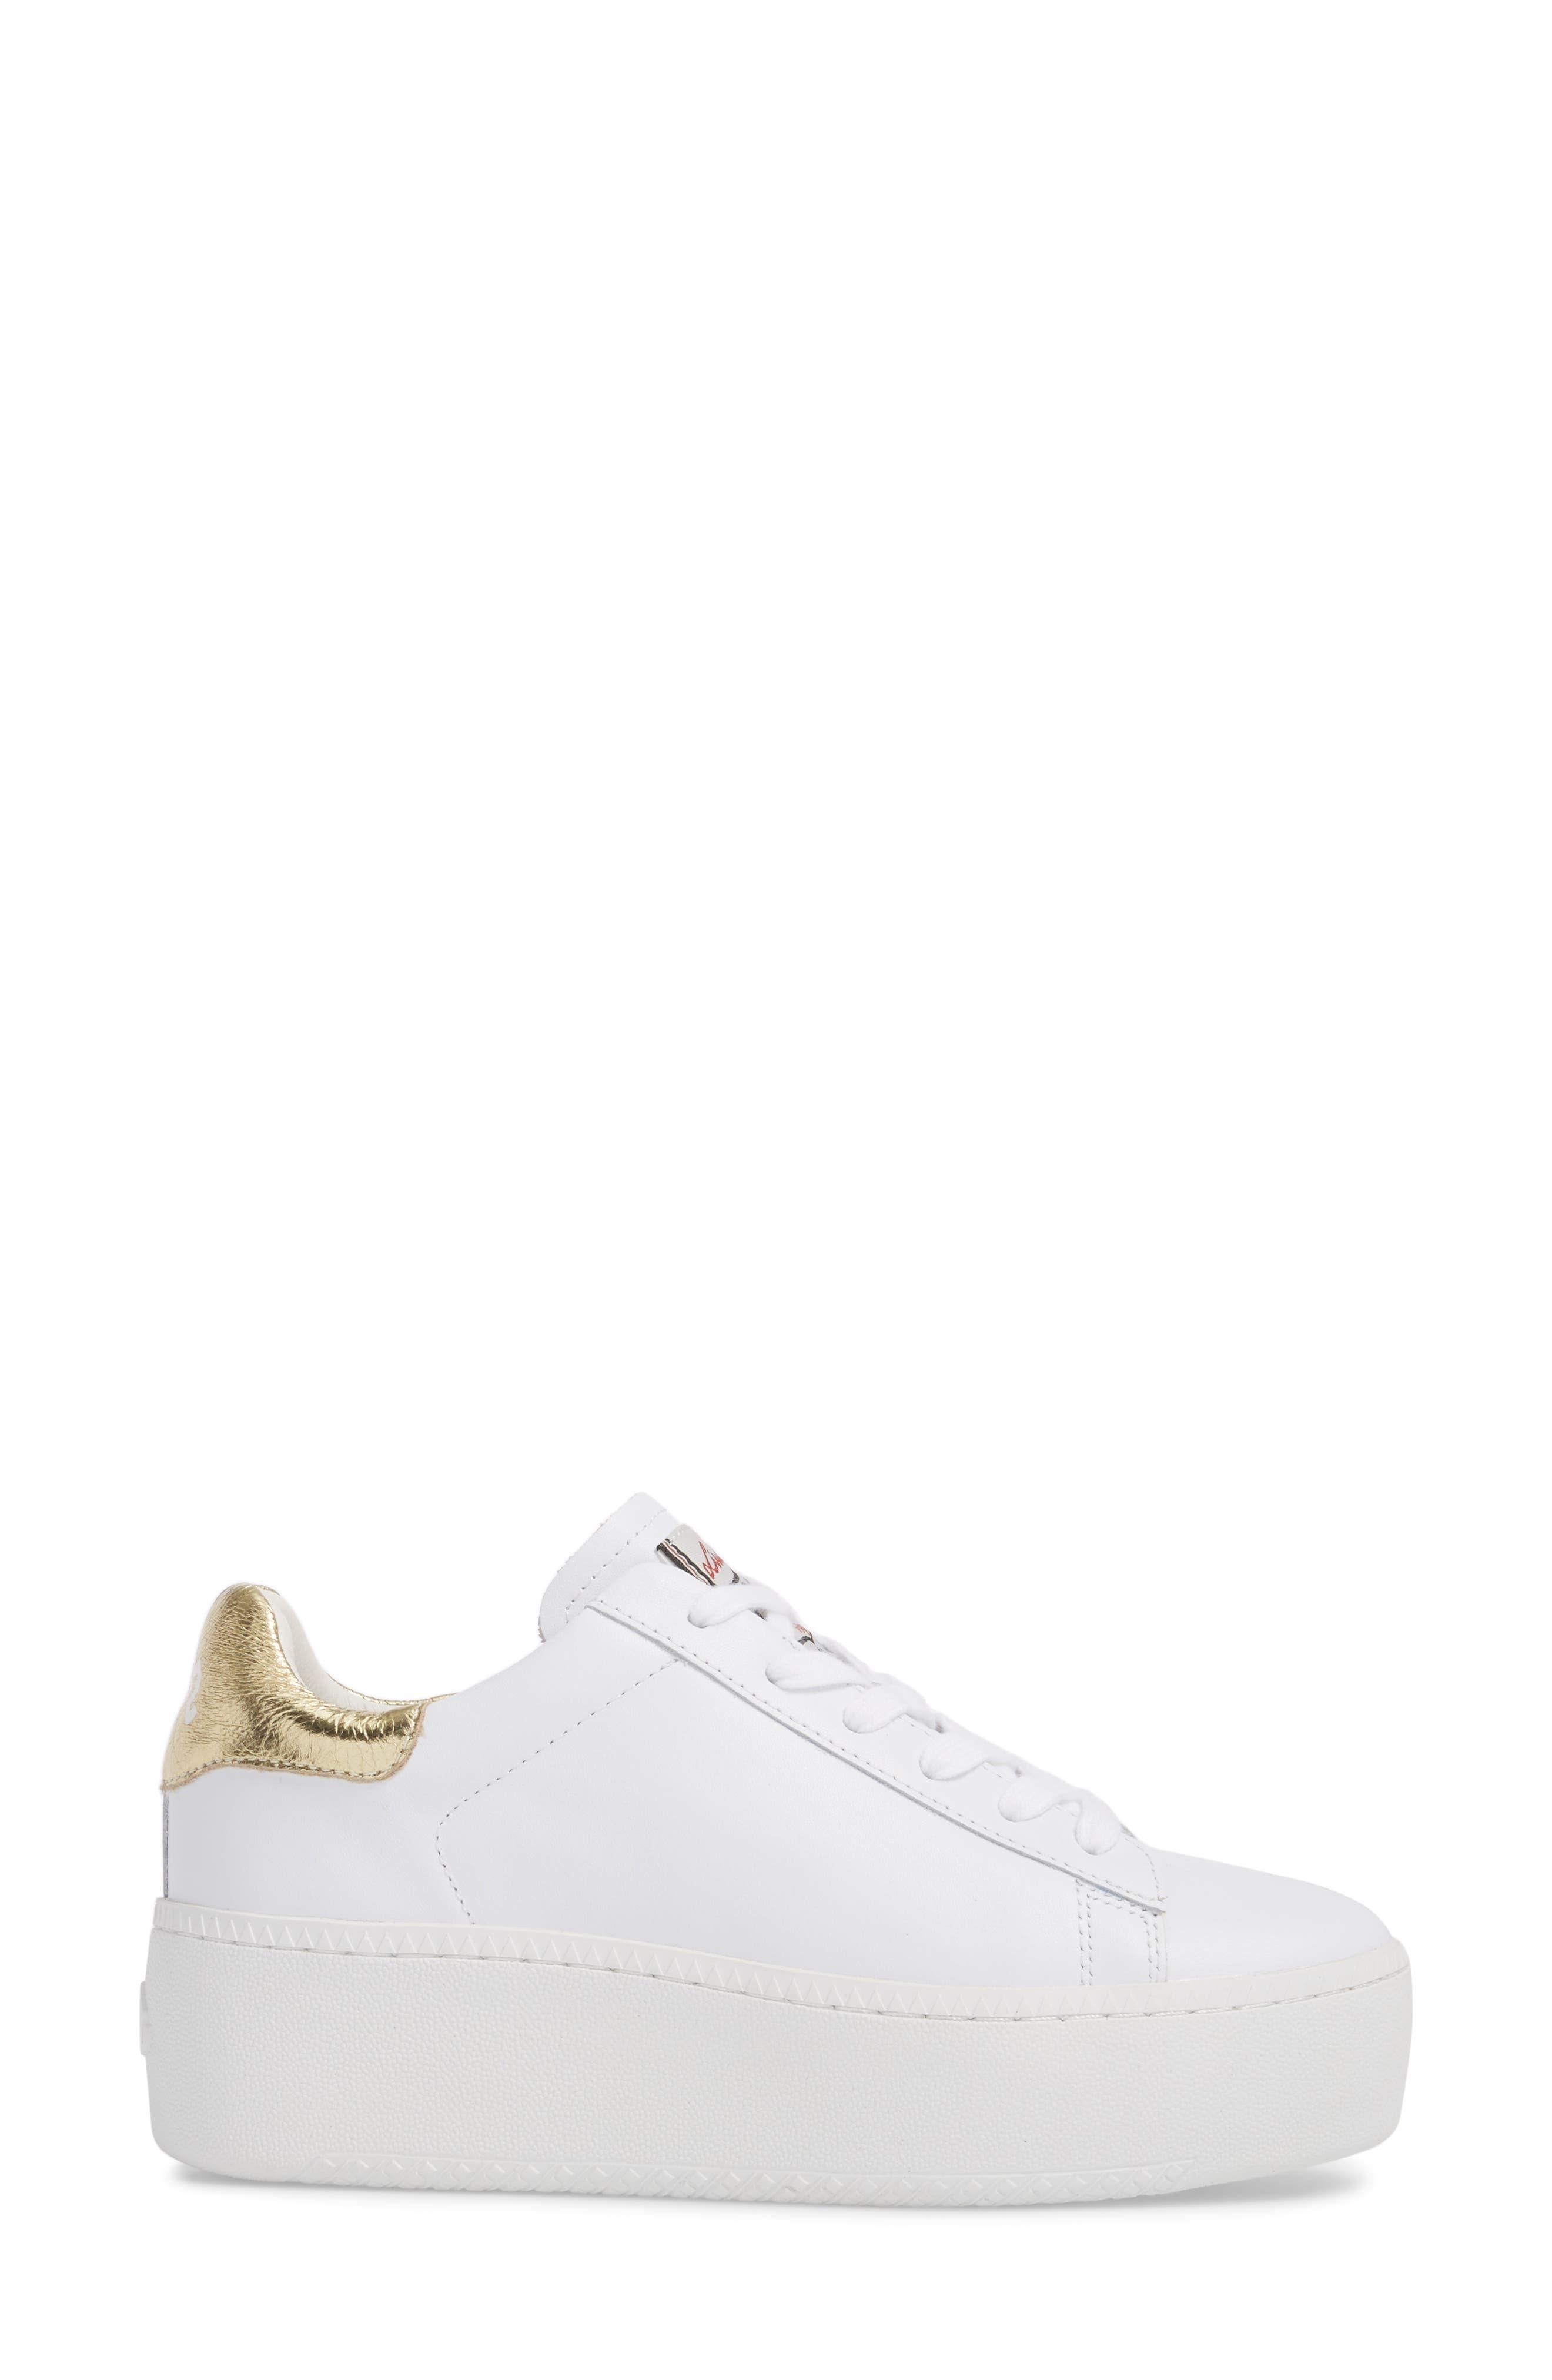 Cult Platform Sneaker,                             Alternate thumbnail 3, color,                             White/ Ariel